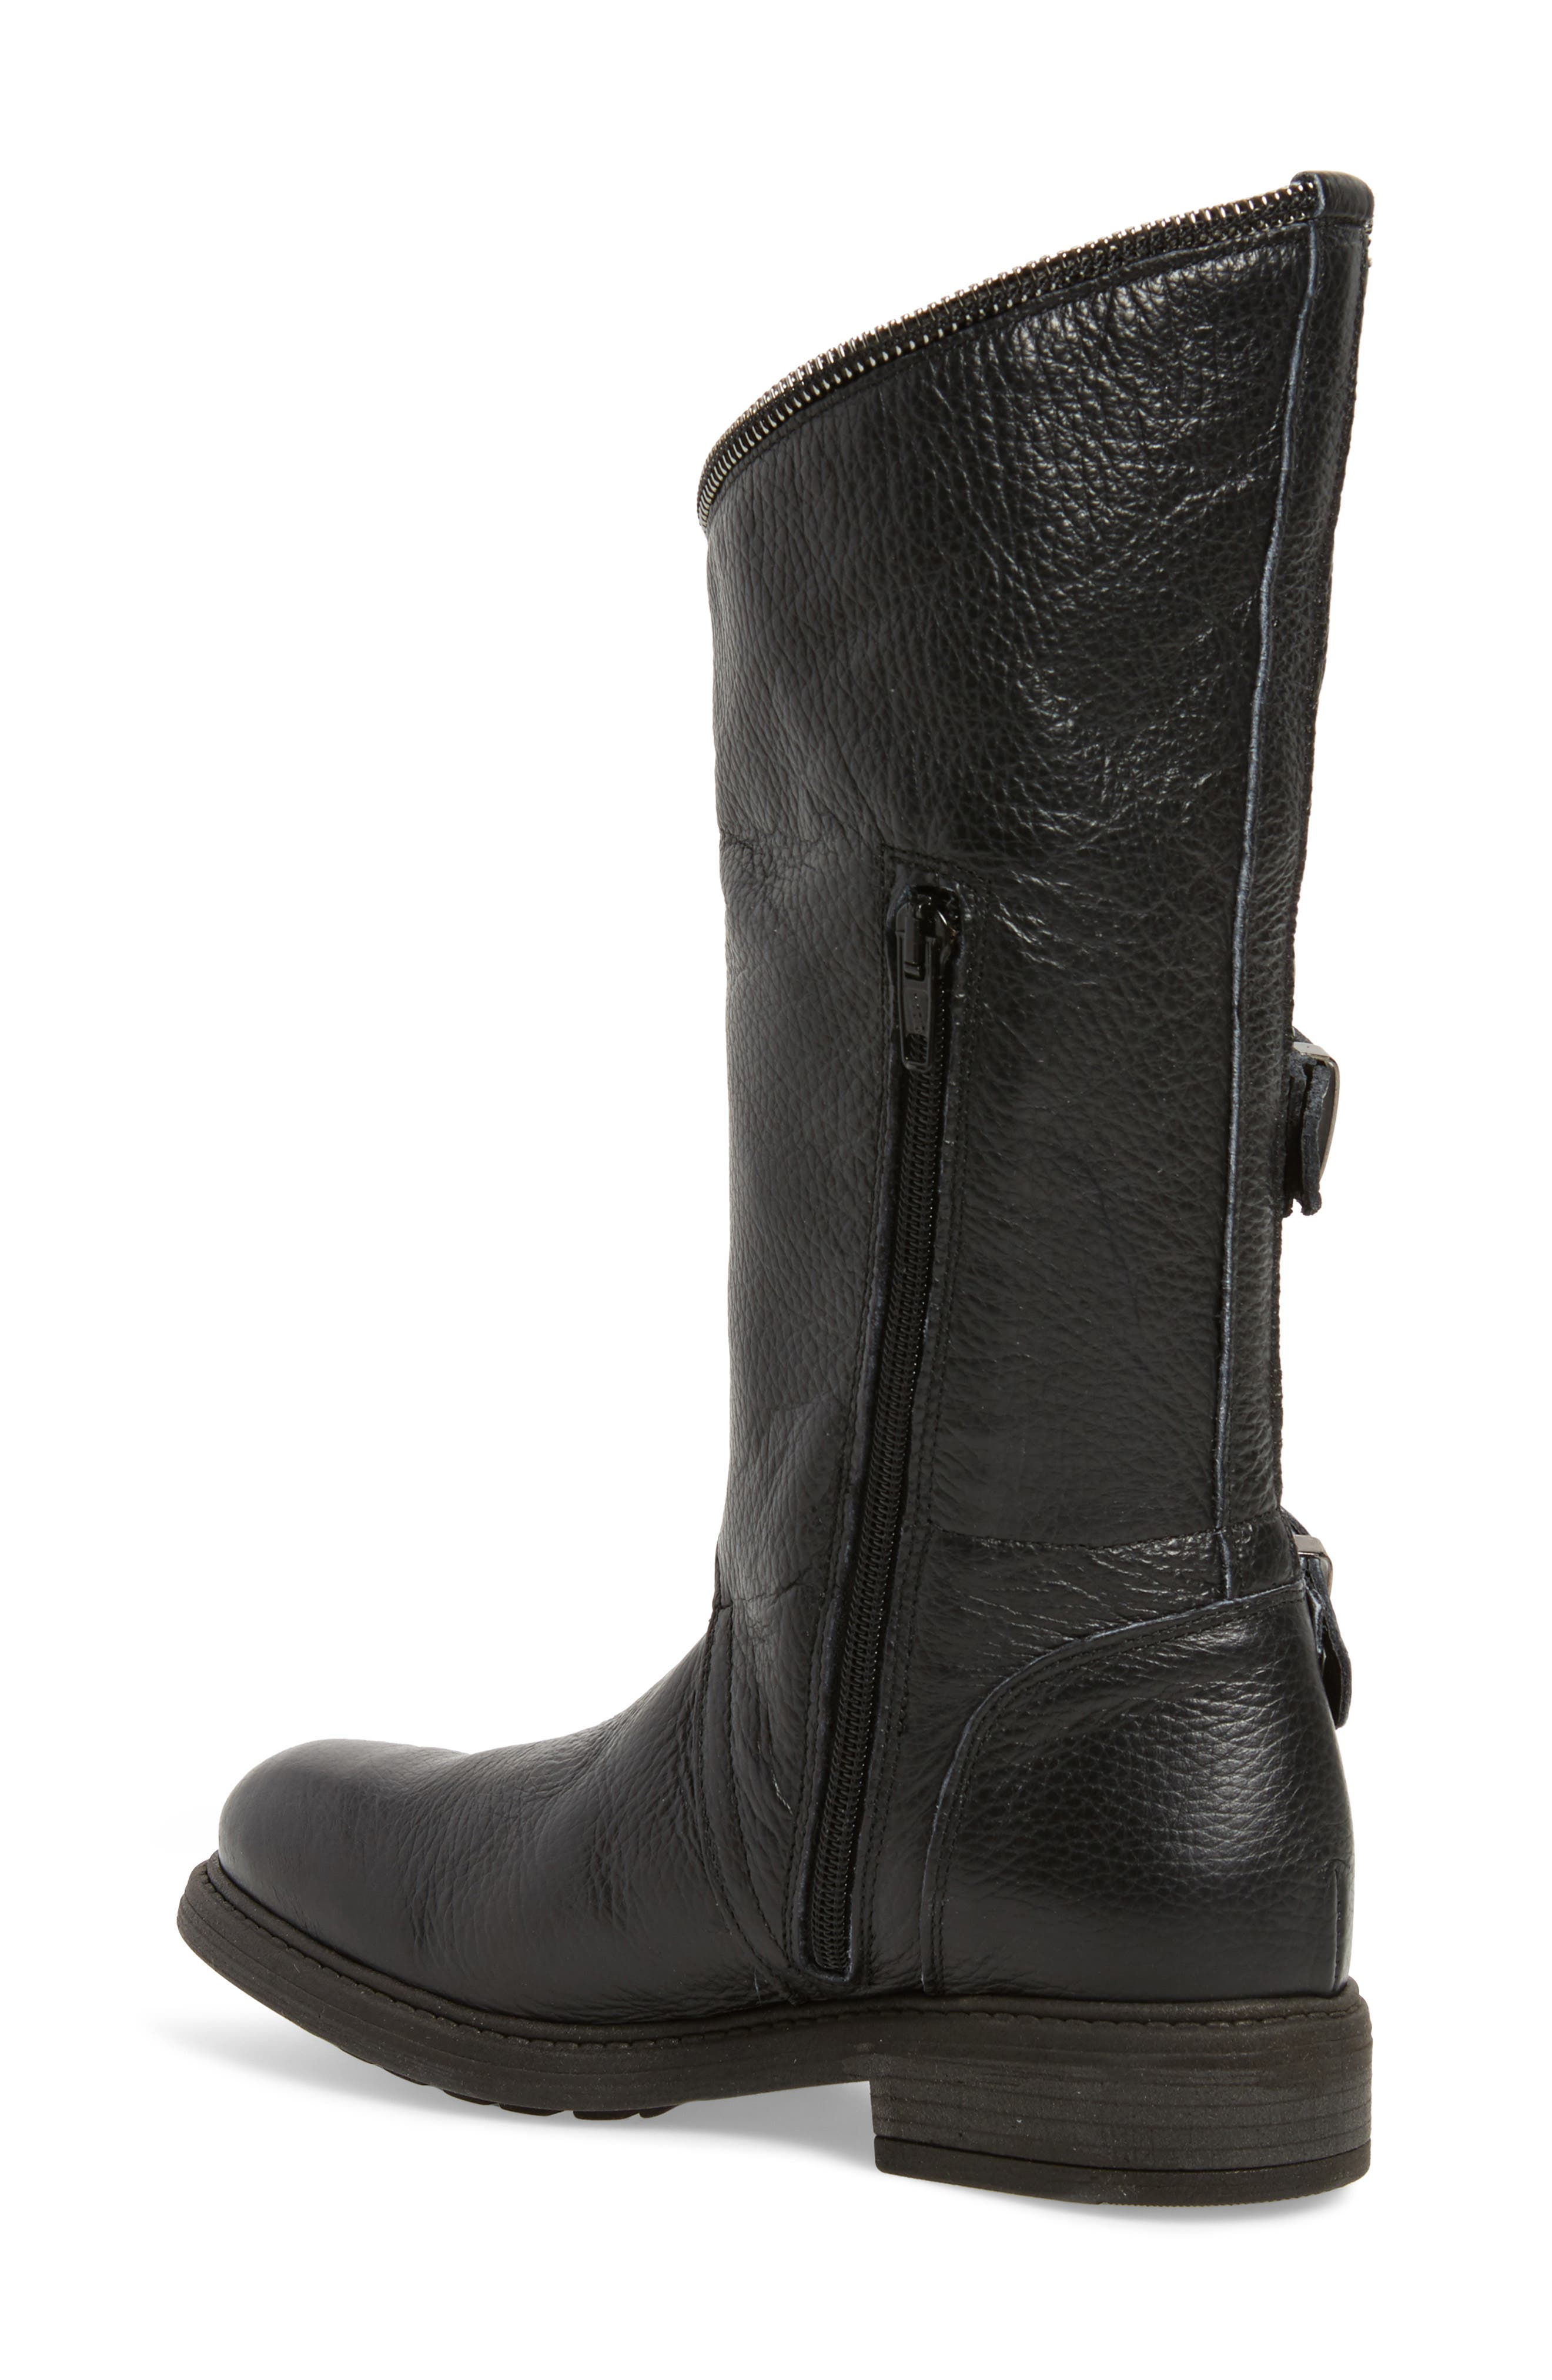 Bray Asymmetrical Zip Boot,                             Alternate thumbnail 2, color,                             Black Leather